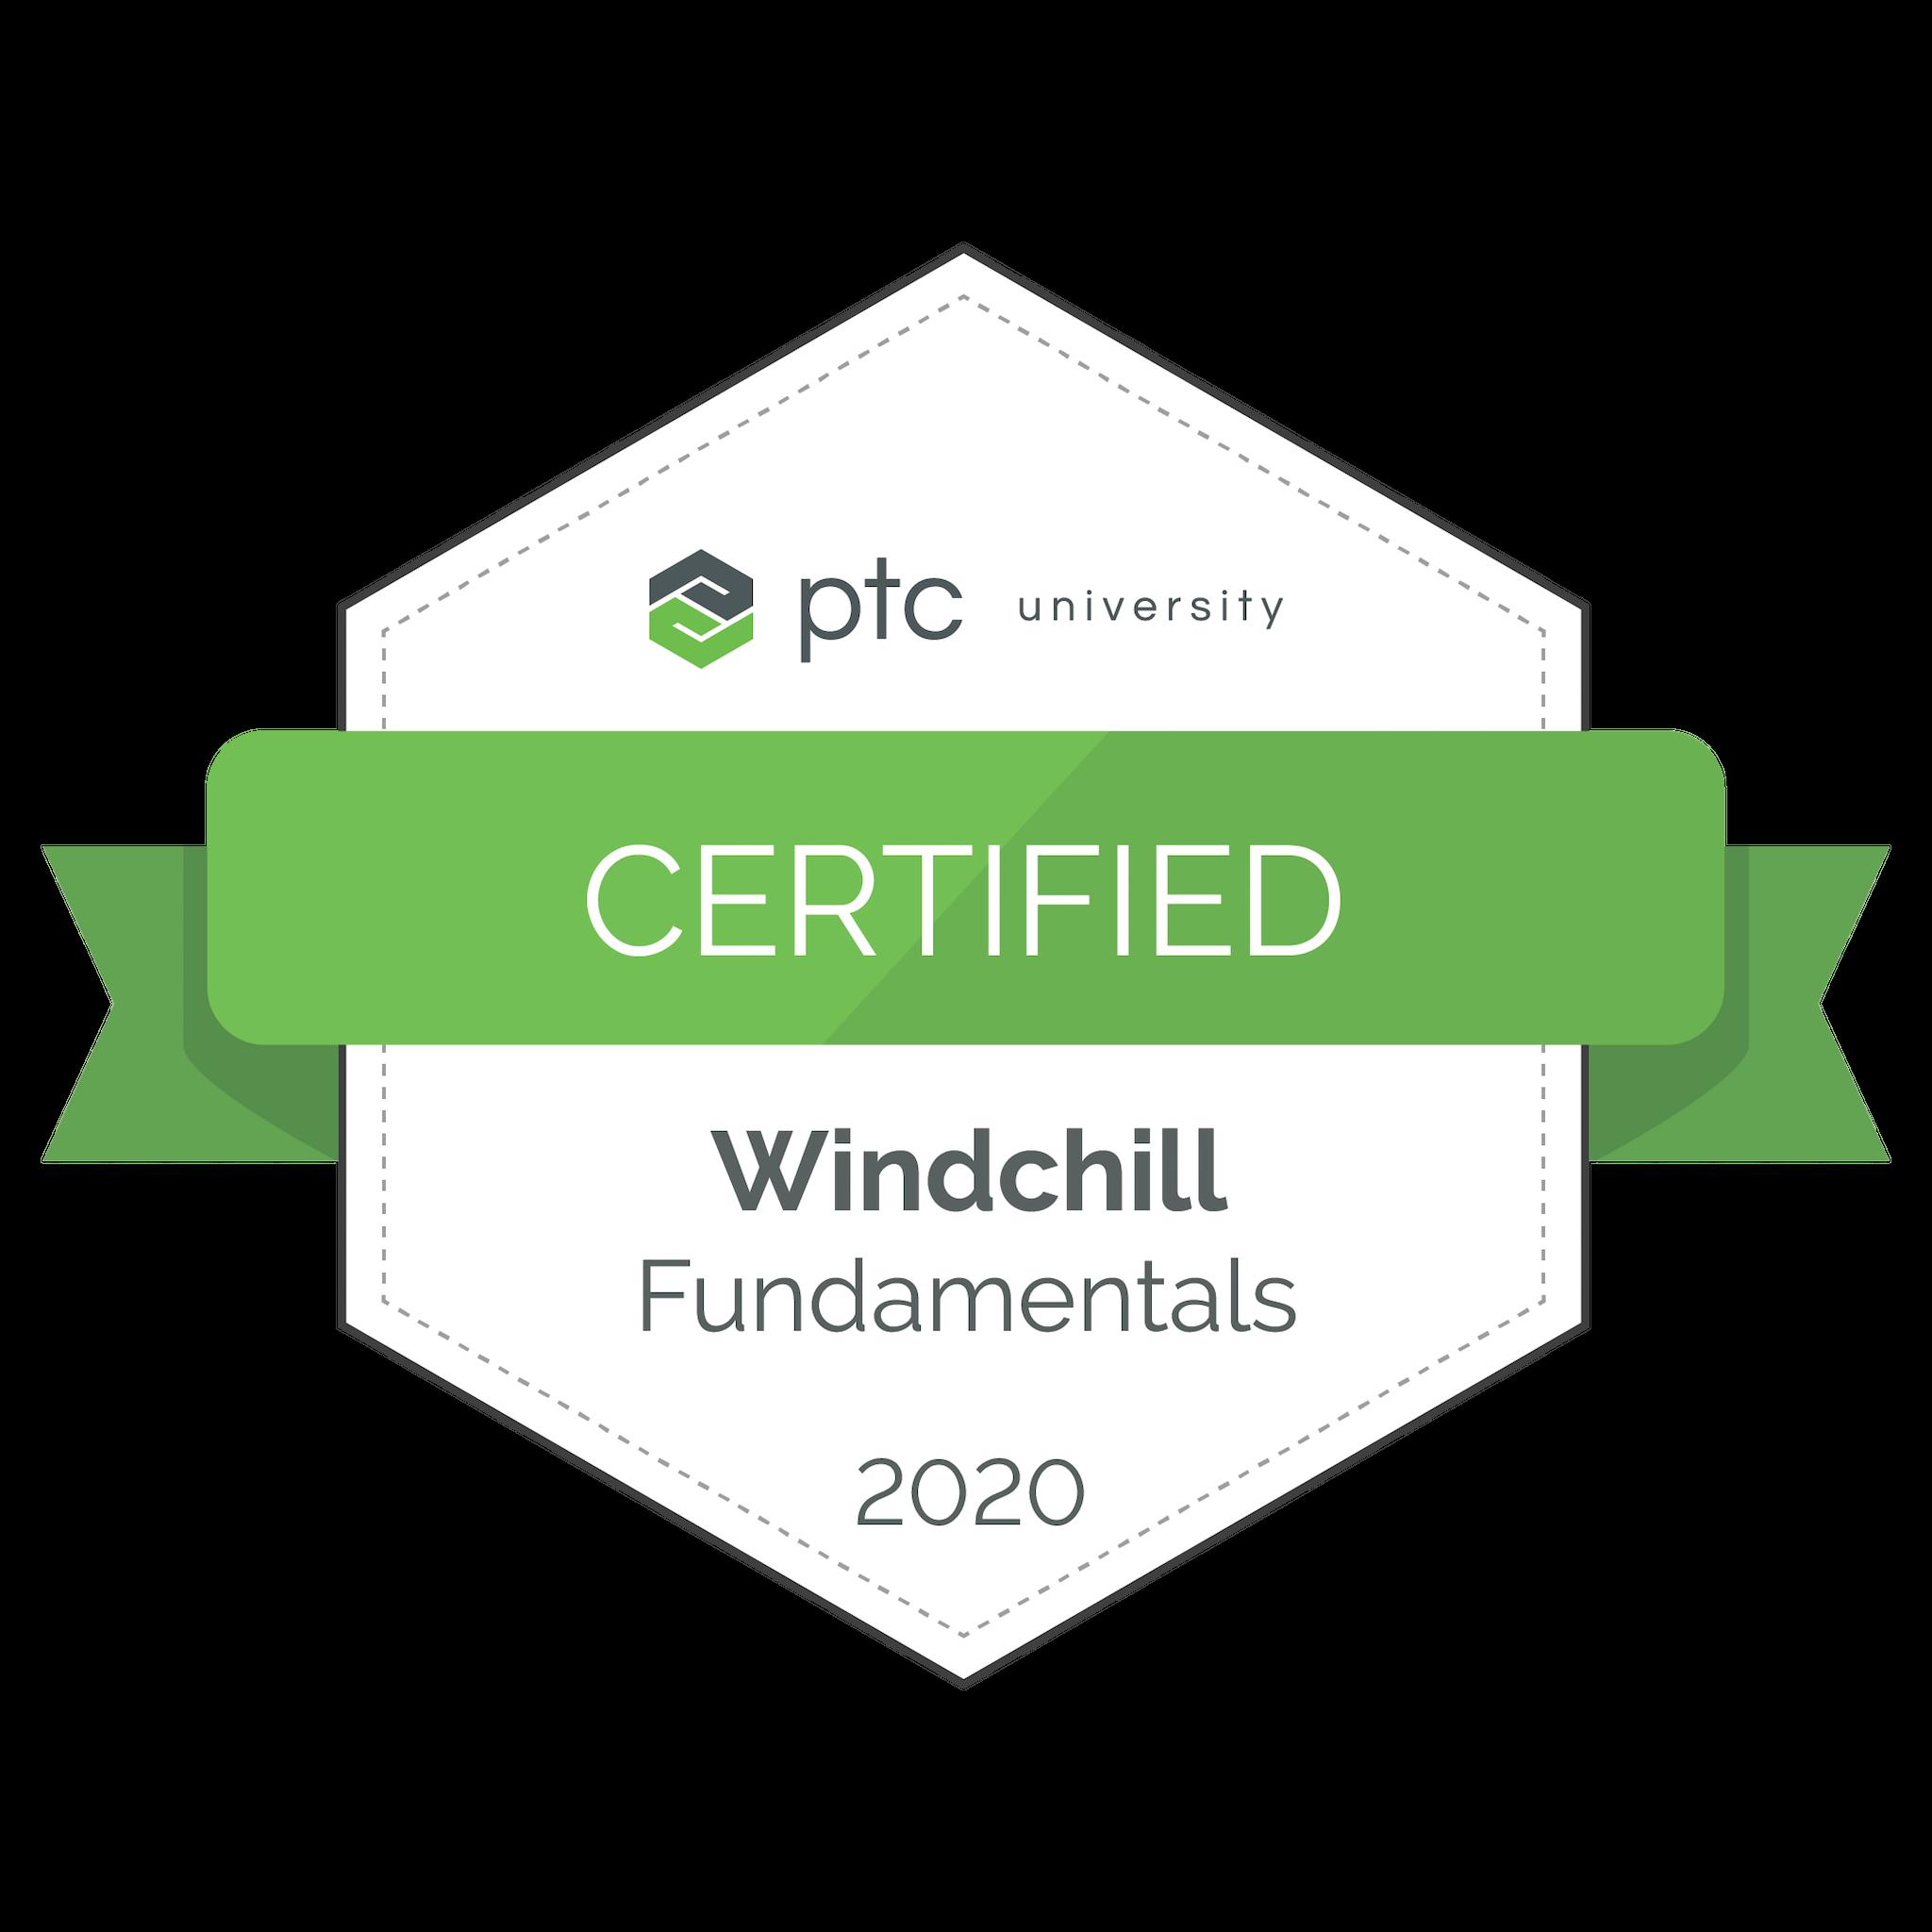 Windchill Fundamentals Certification 2020